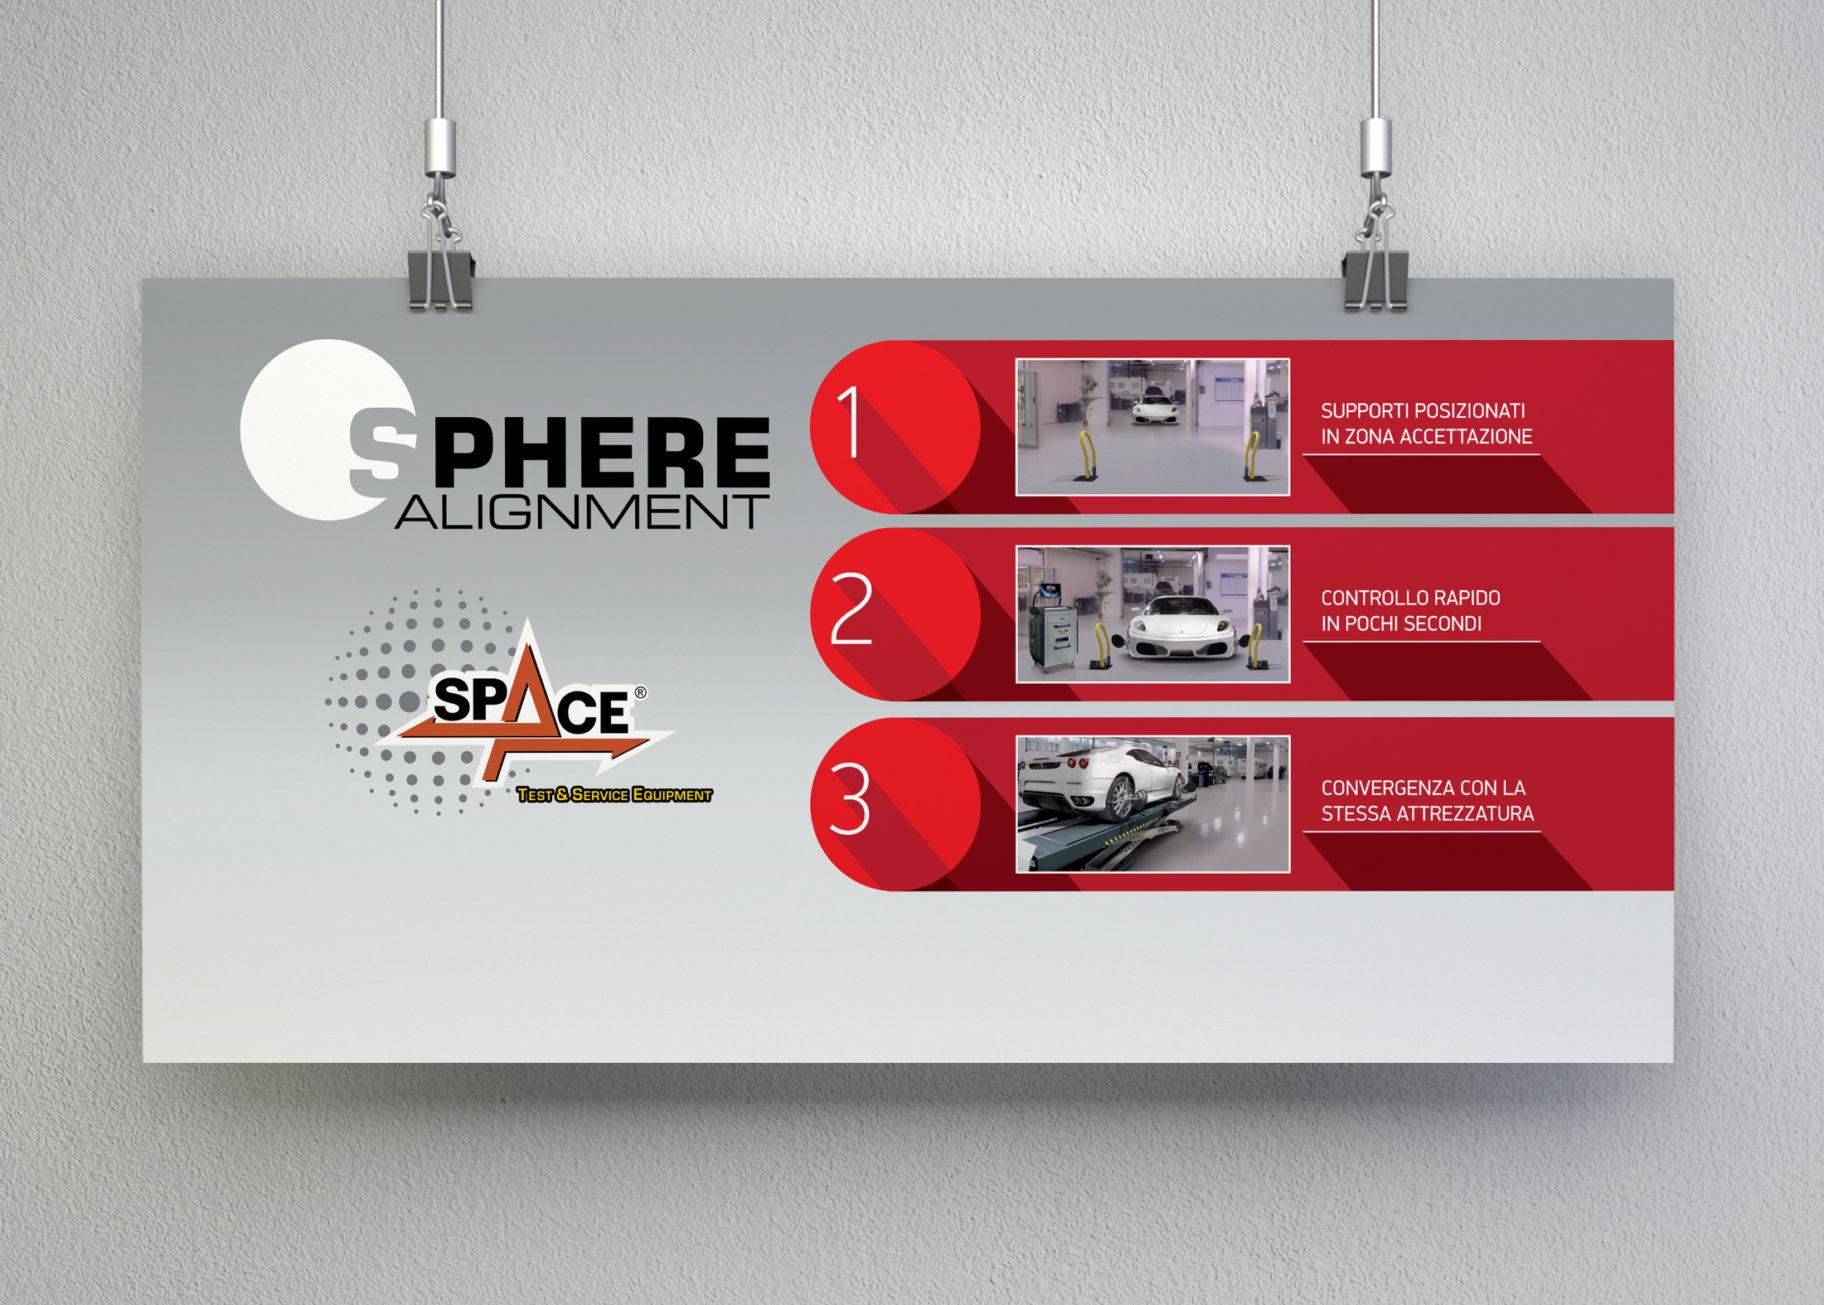 SPHERE-Alignment-logo-poster 02